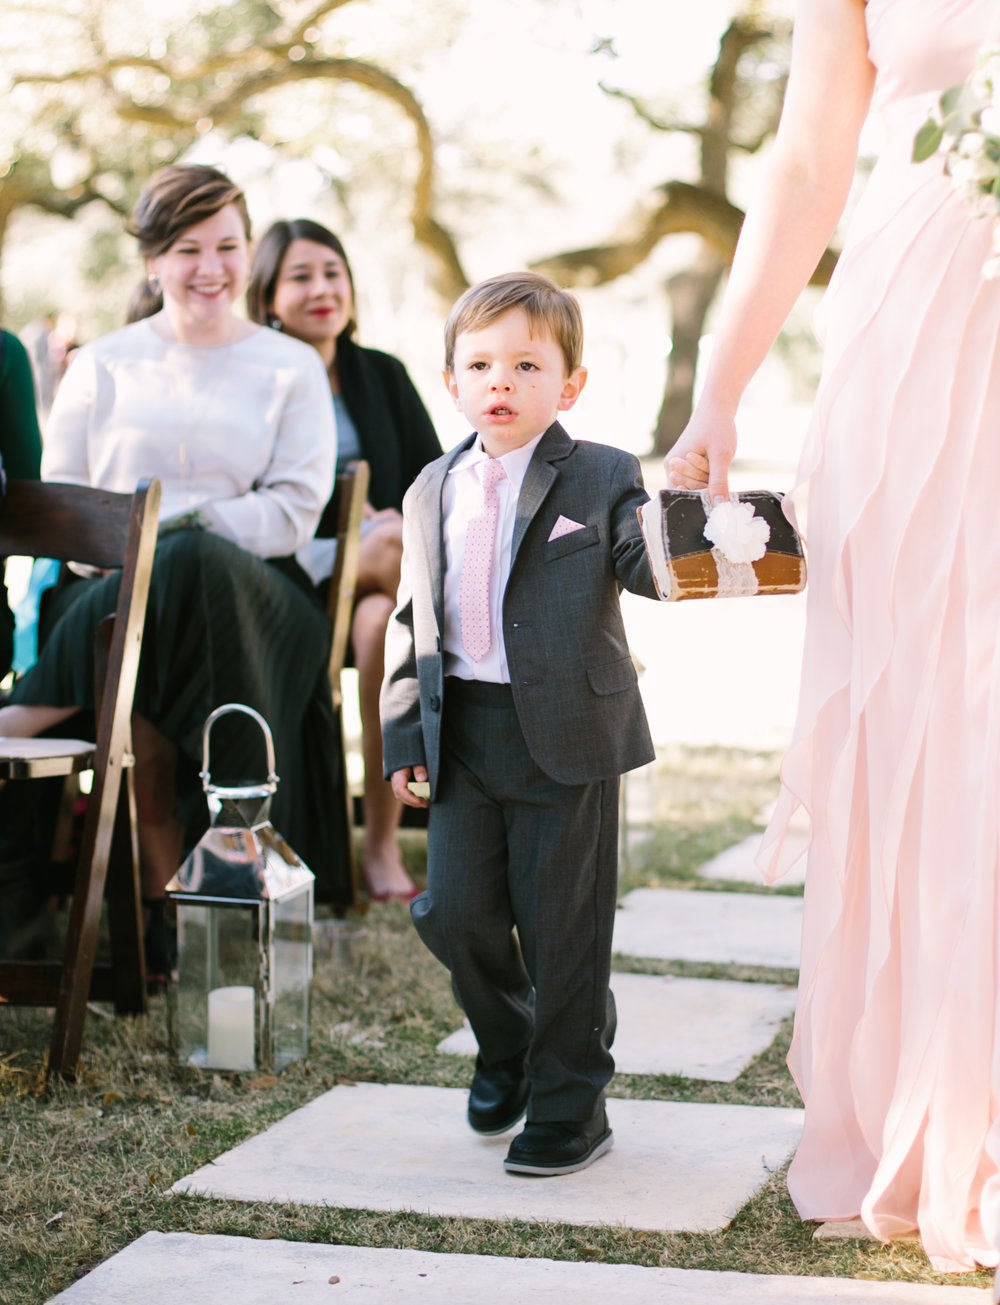 Central Texas Wedding | Vineyards at Chappel Lodge | Fine Art | Emilie Anne Photography-5.jpg